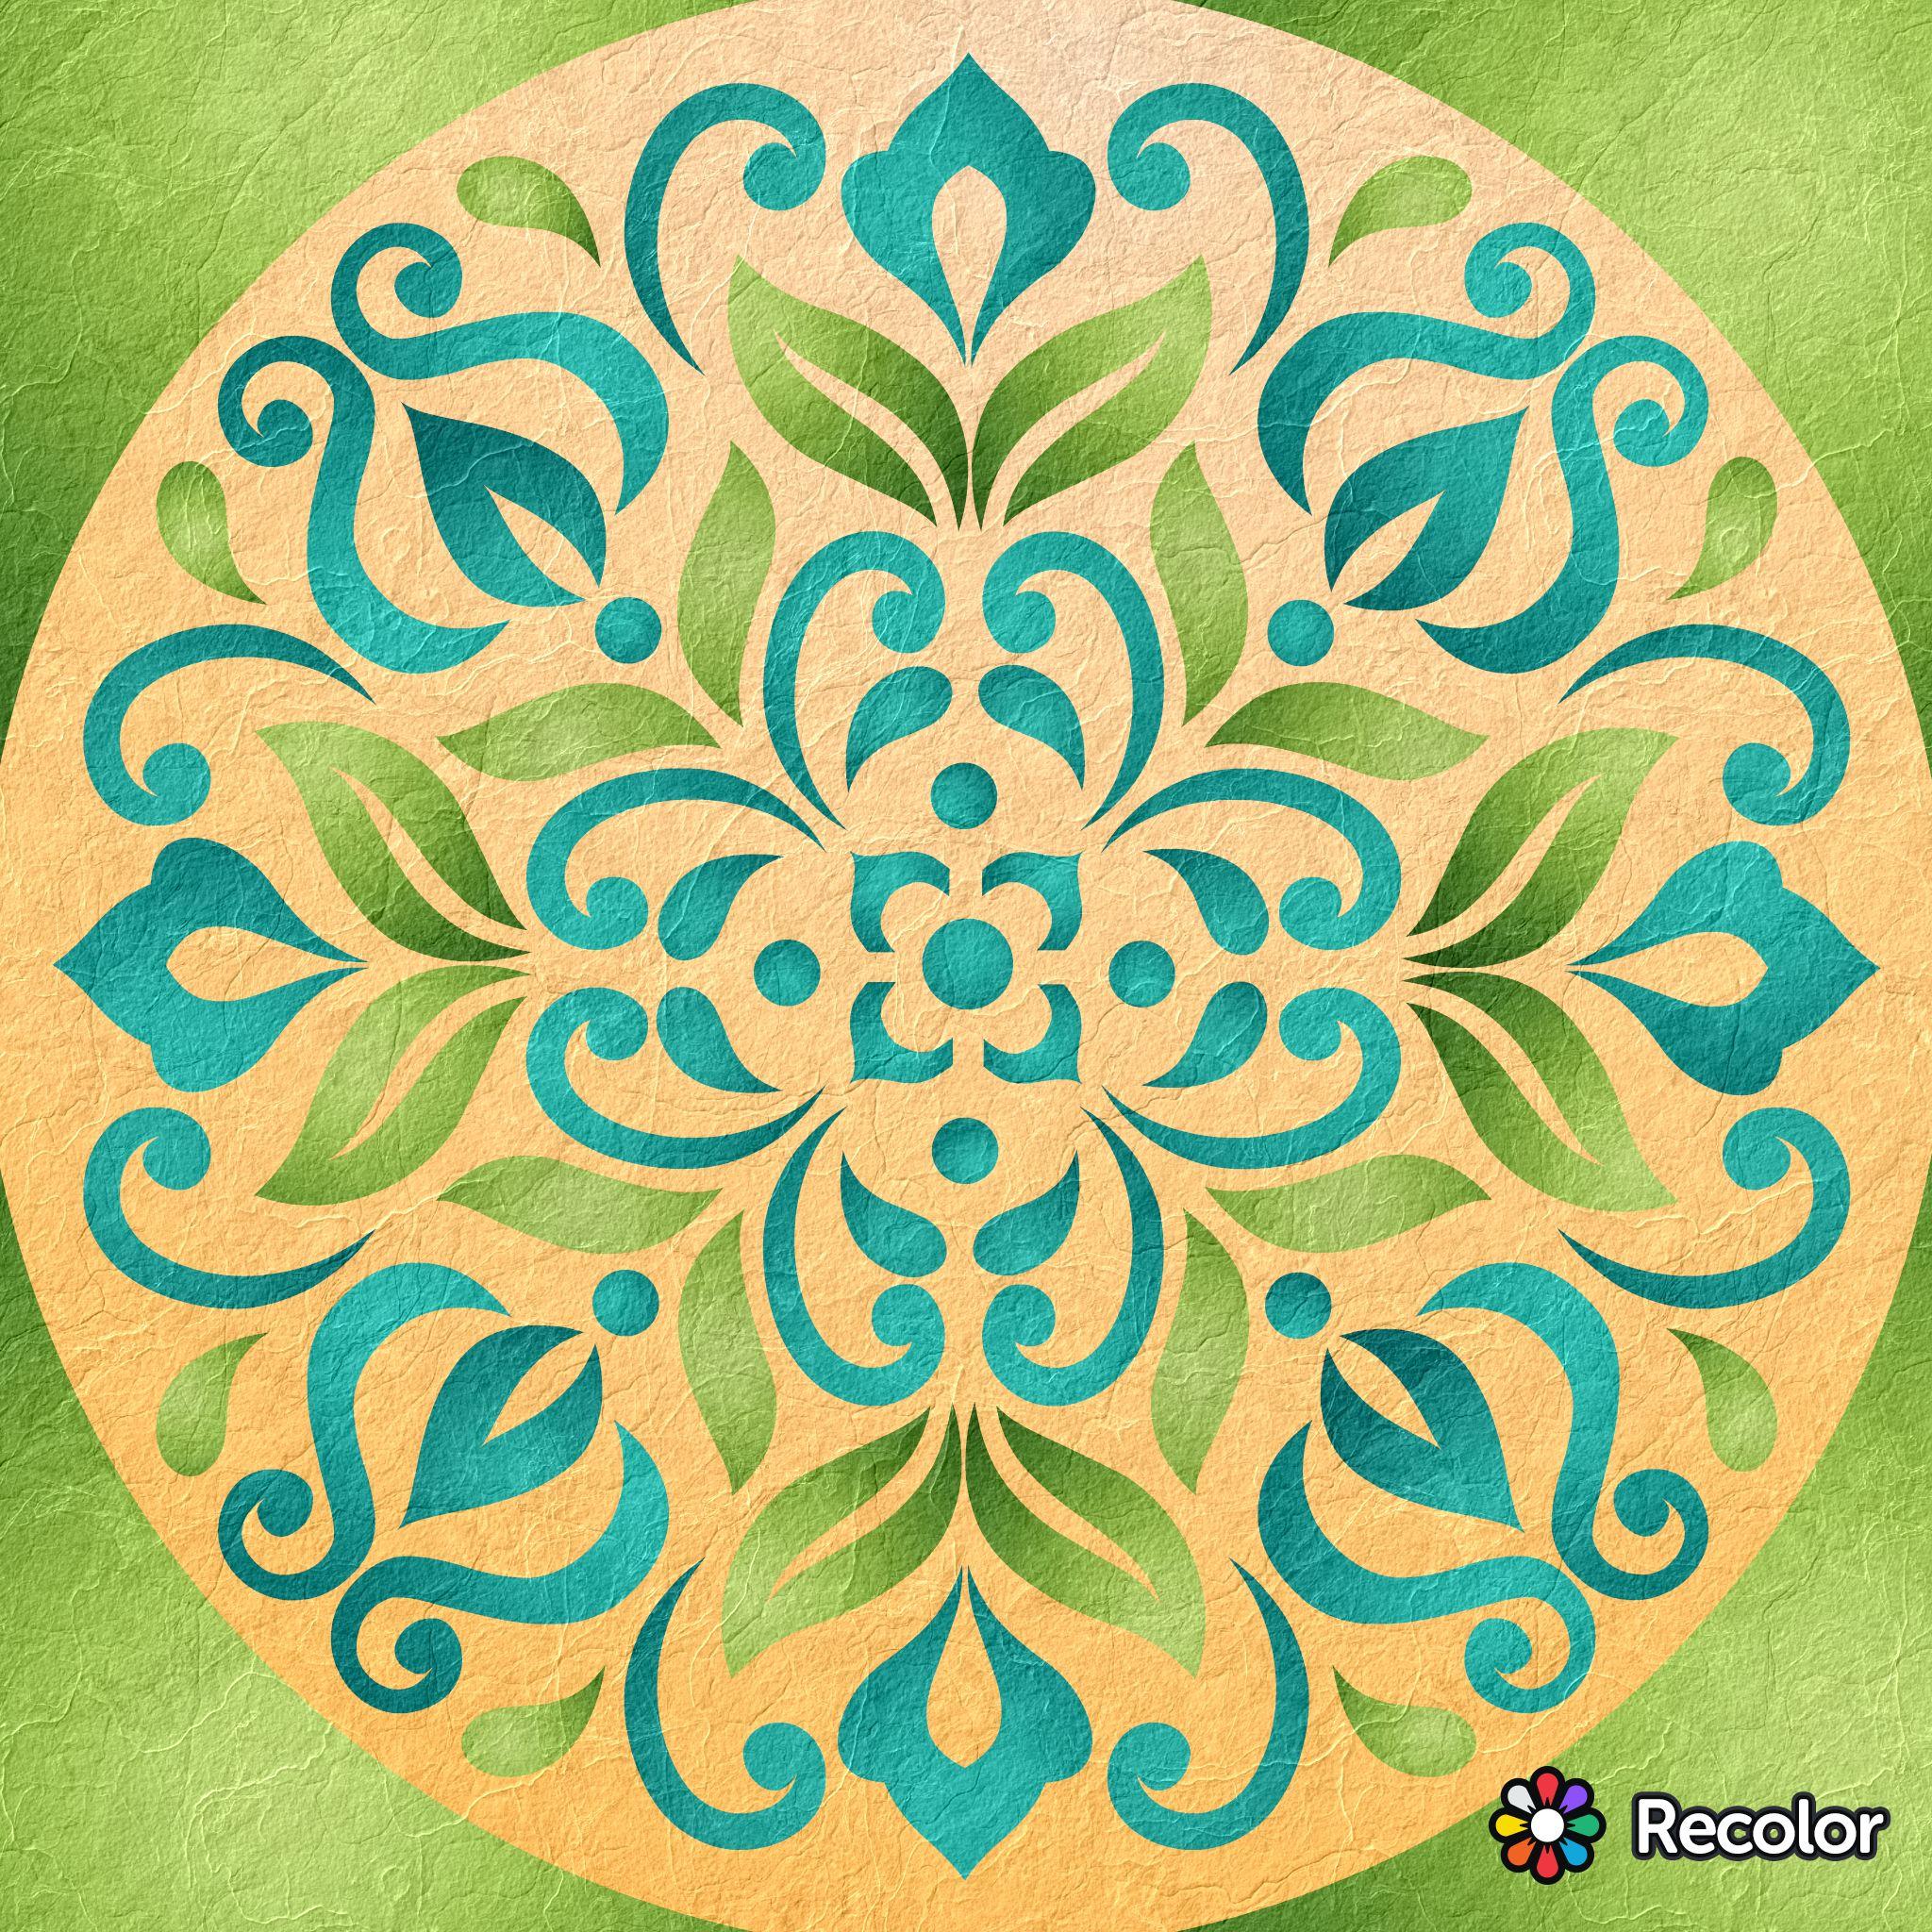 Teal Green Peach Mandala Gradient Colors With Art Paper Effect Bunte Bilder Bunt Bilder